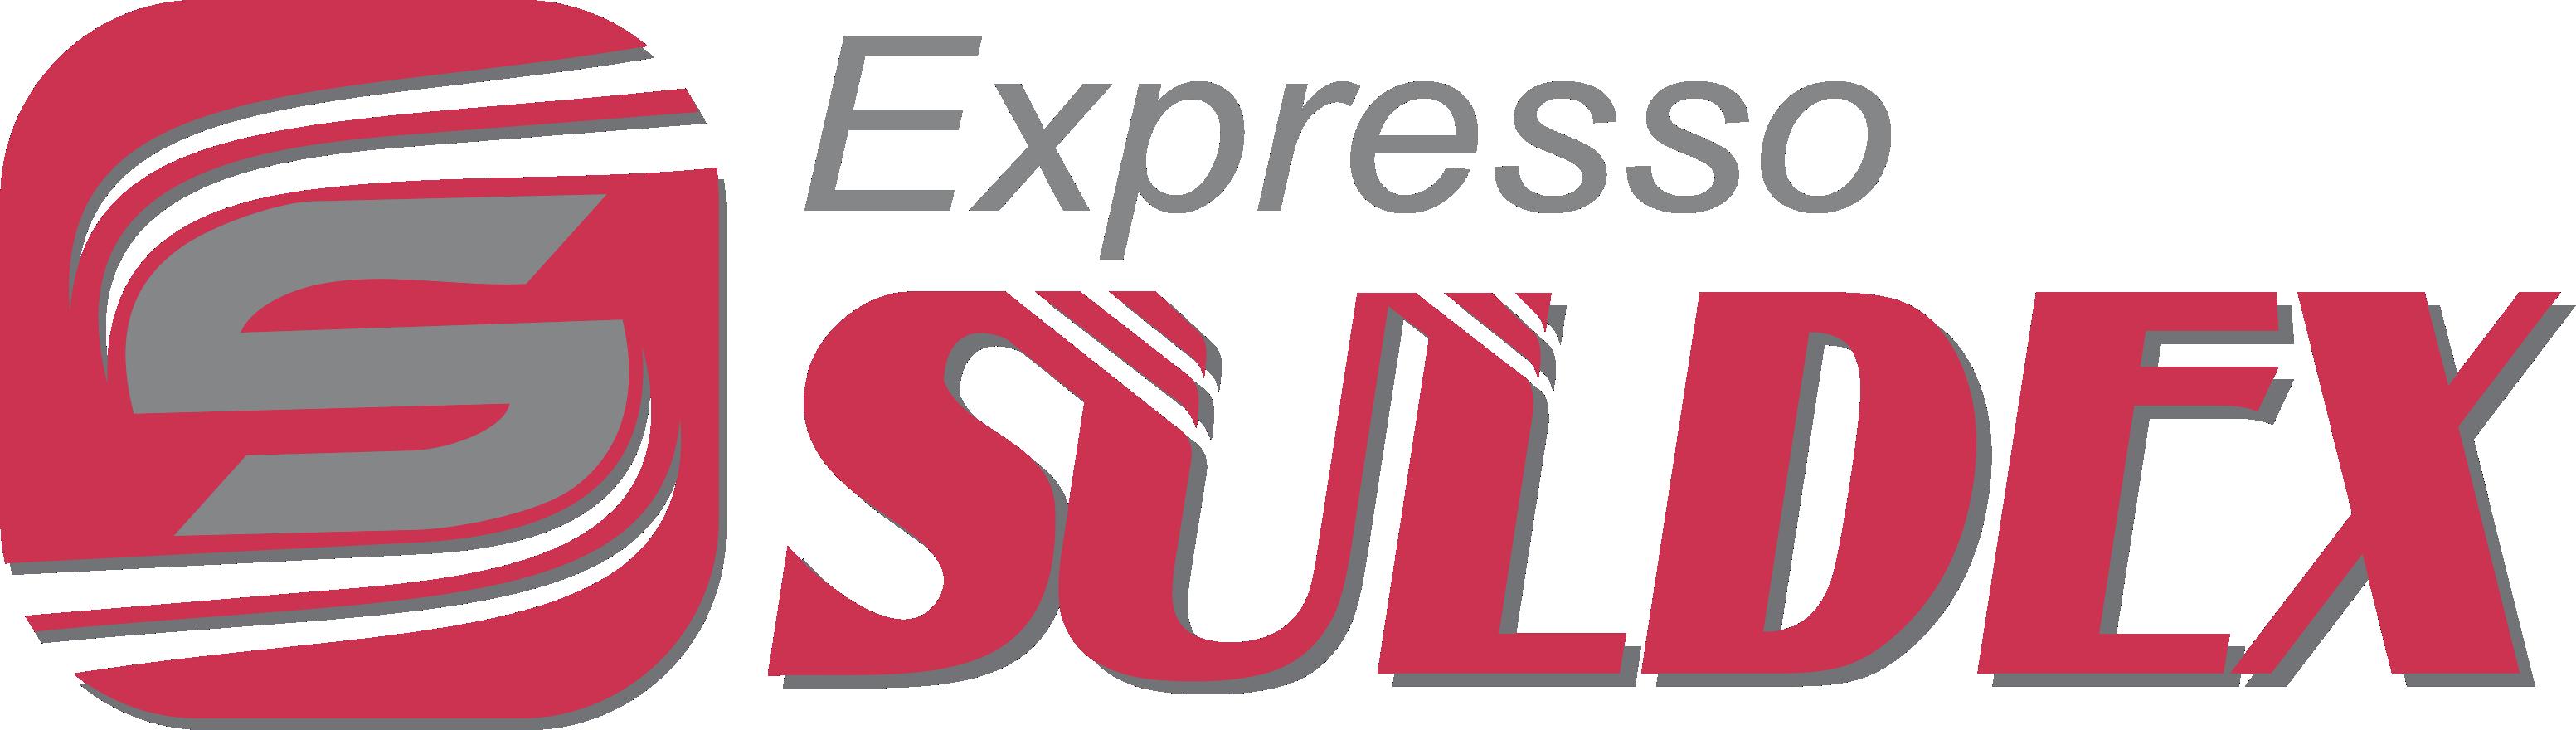 Expresso Suldex